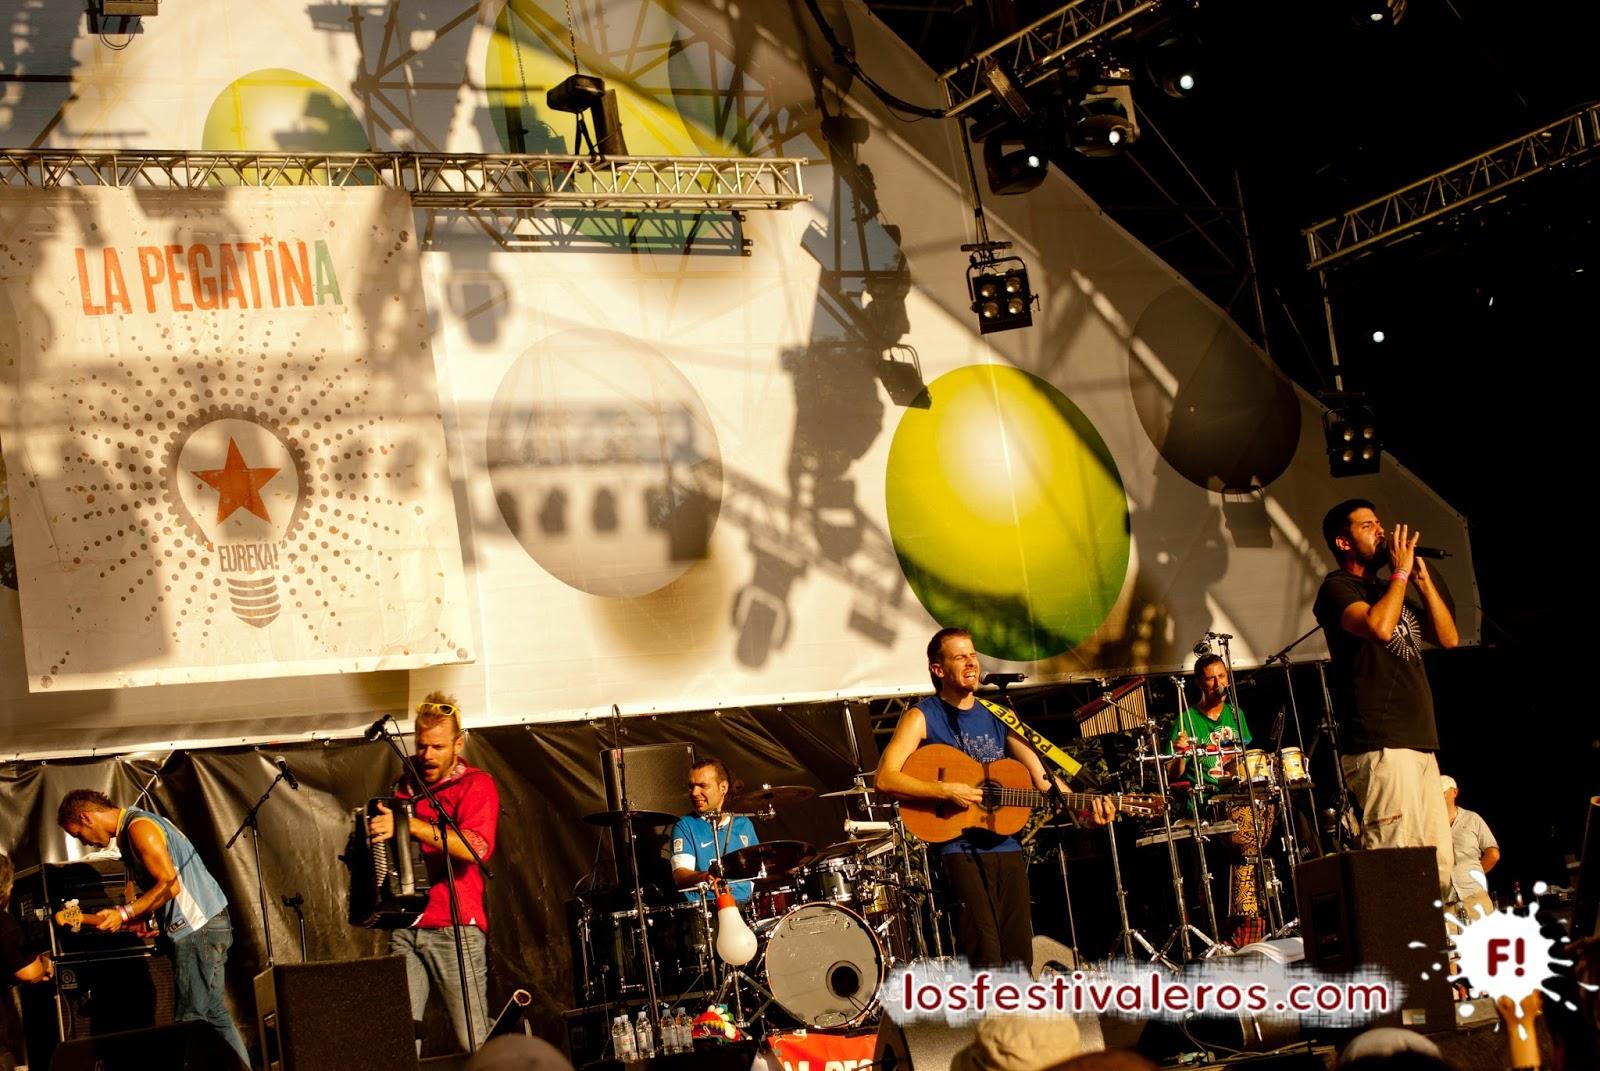 La Pegatina, Planet Babylon, 2014, Festival